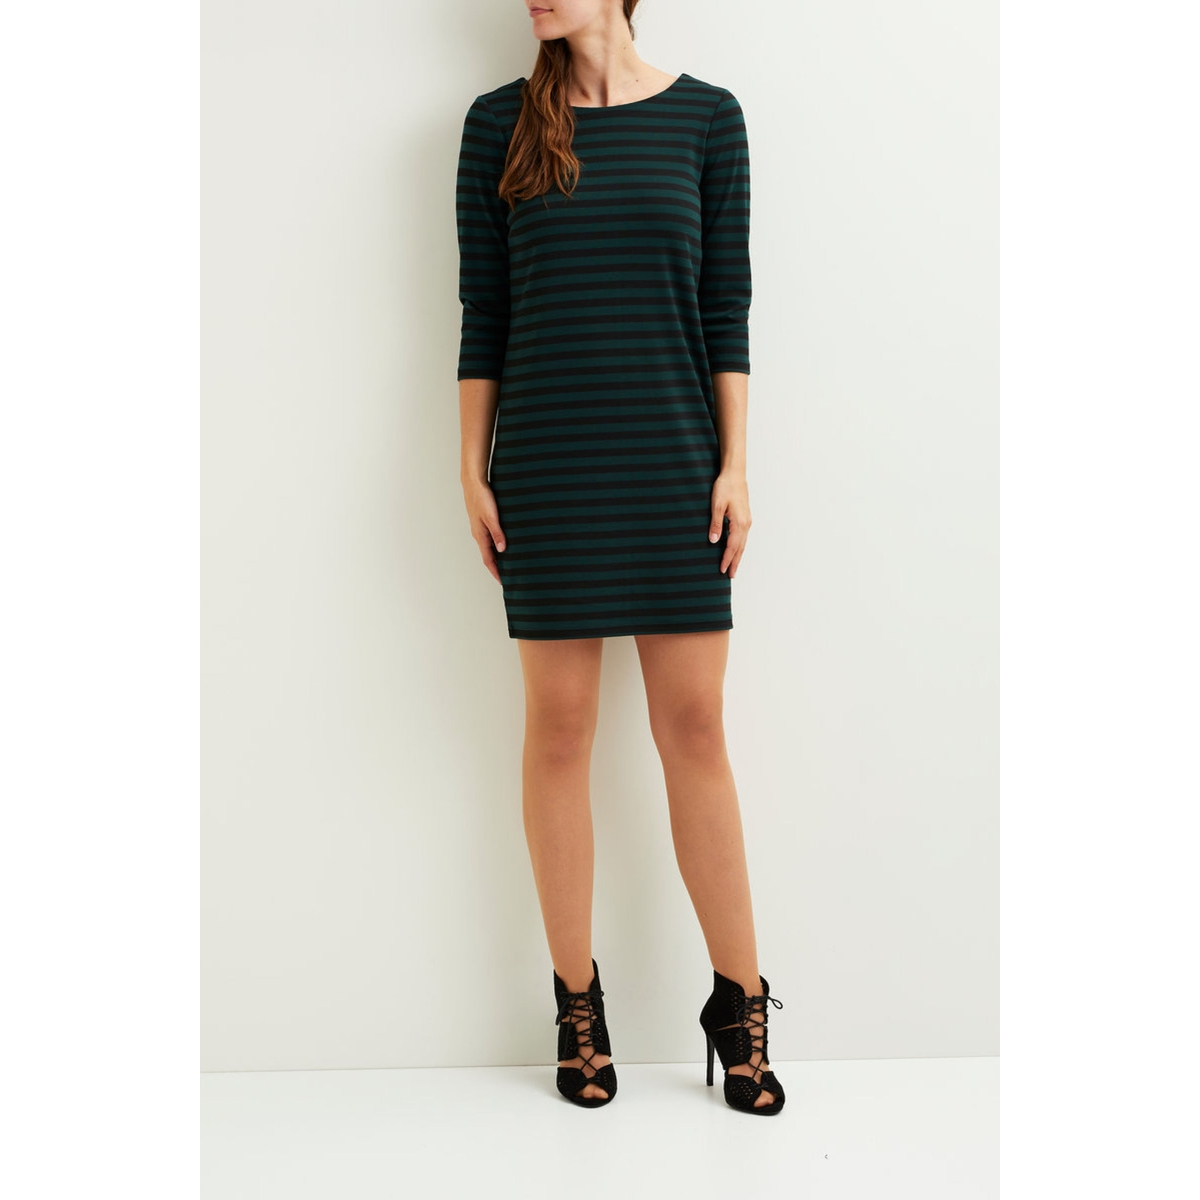 vitinny new dress-fav 14043495 vila jurk pine grove/black